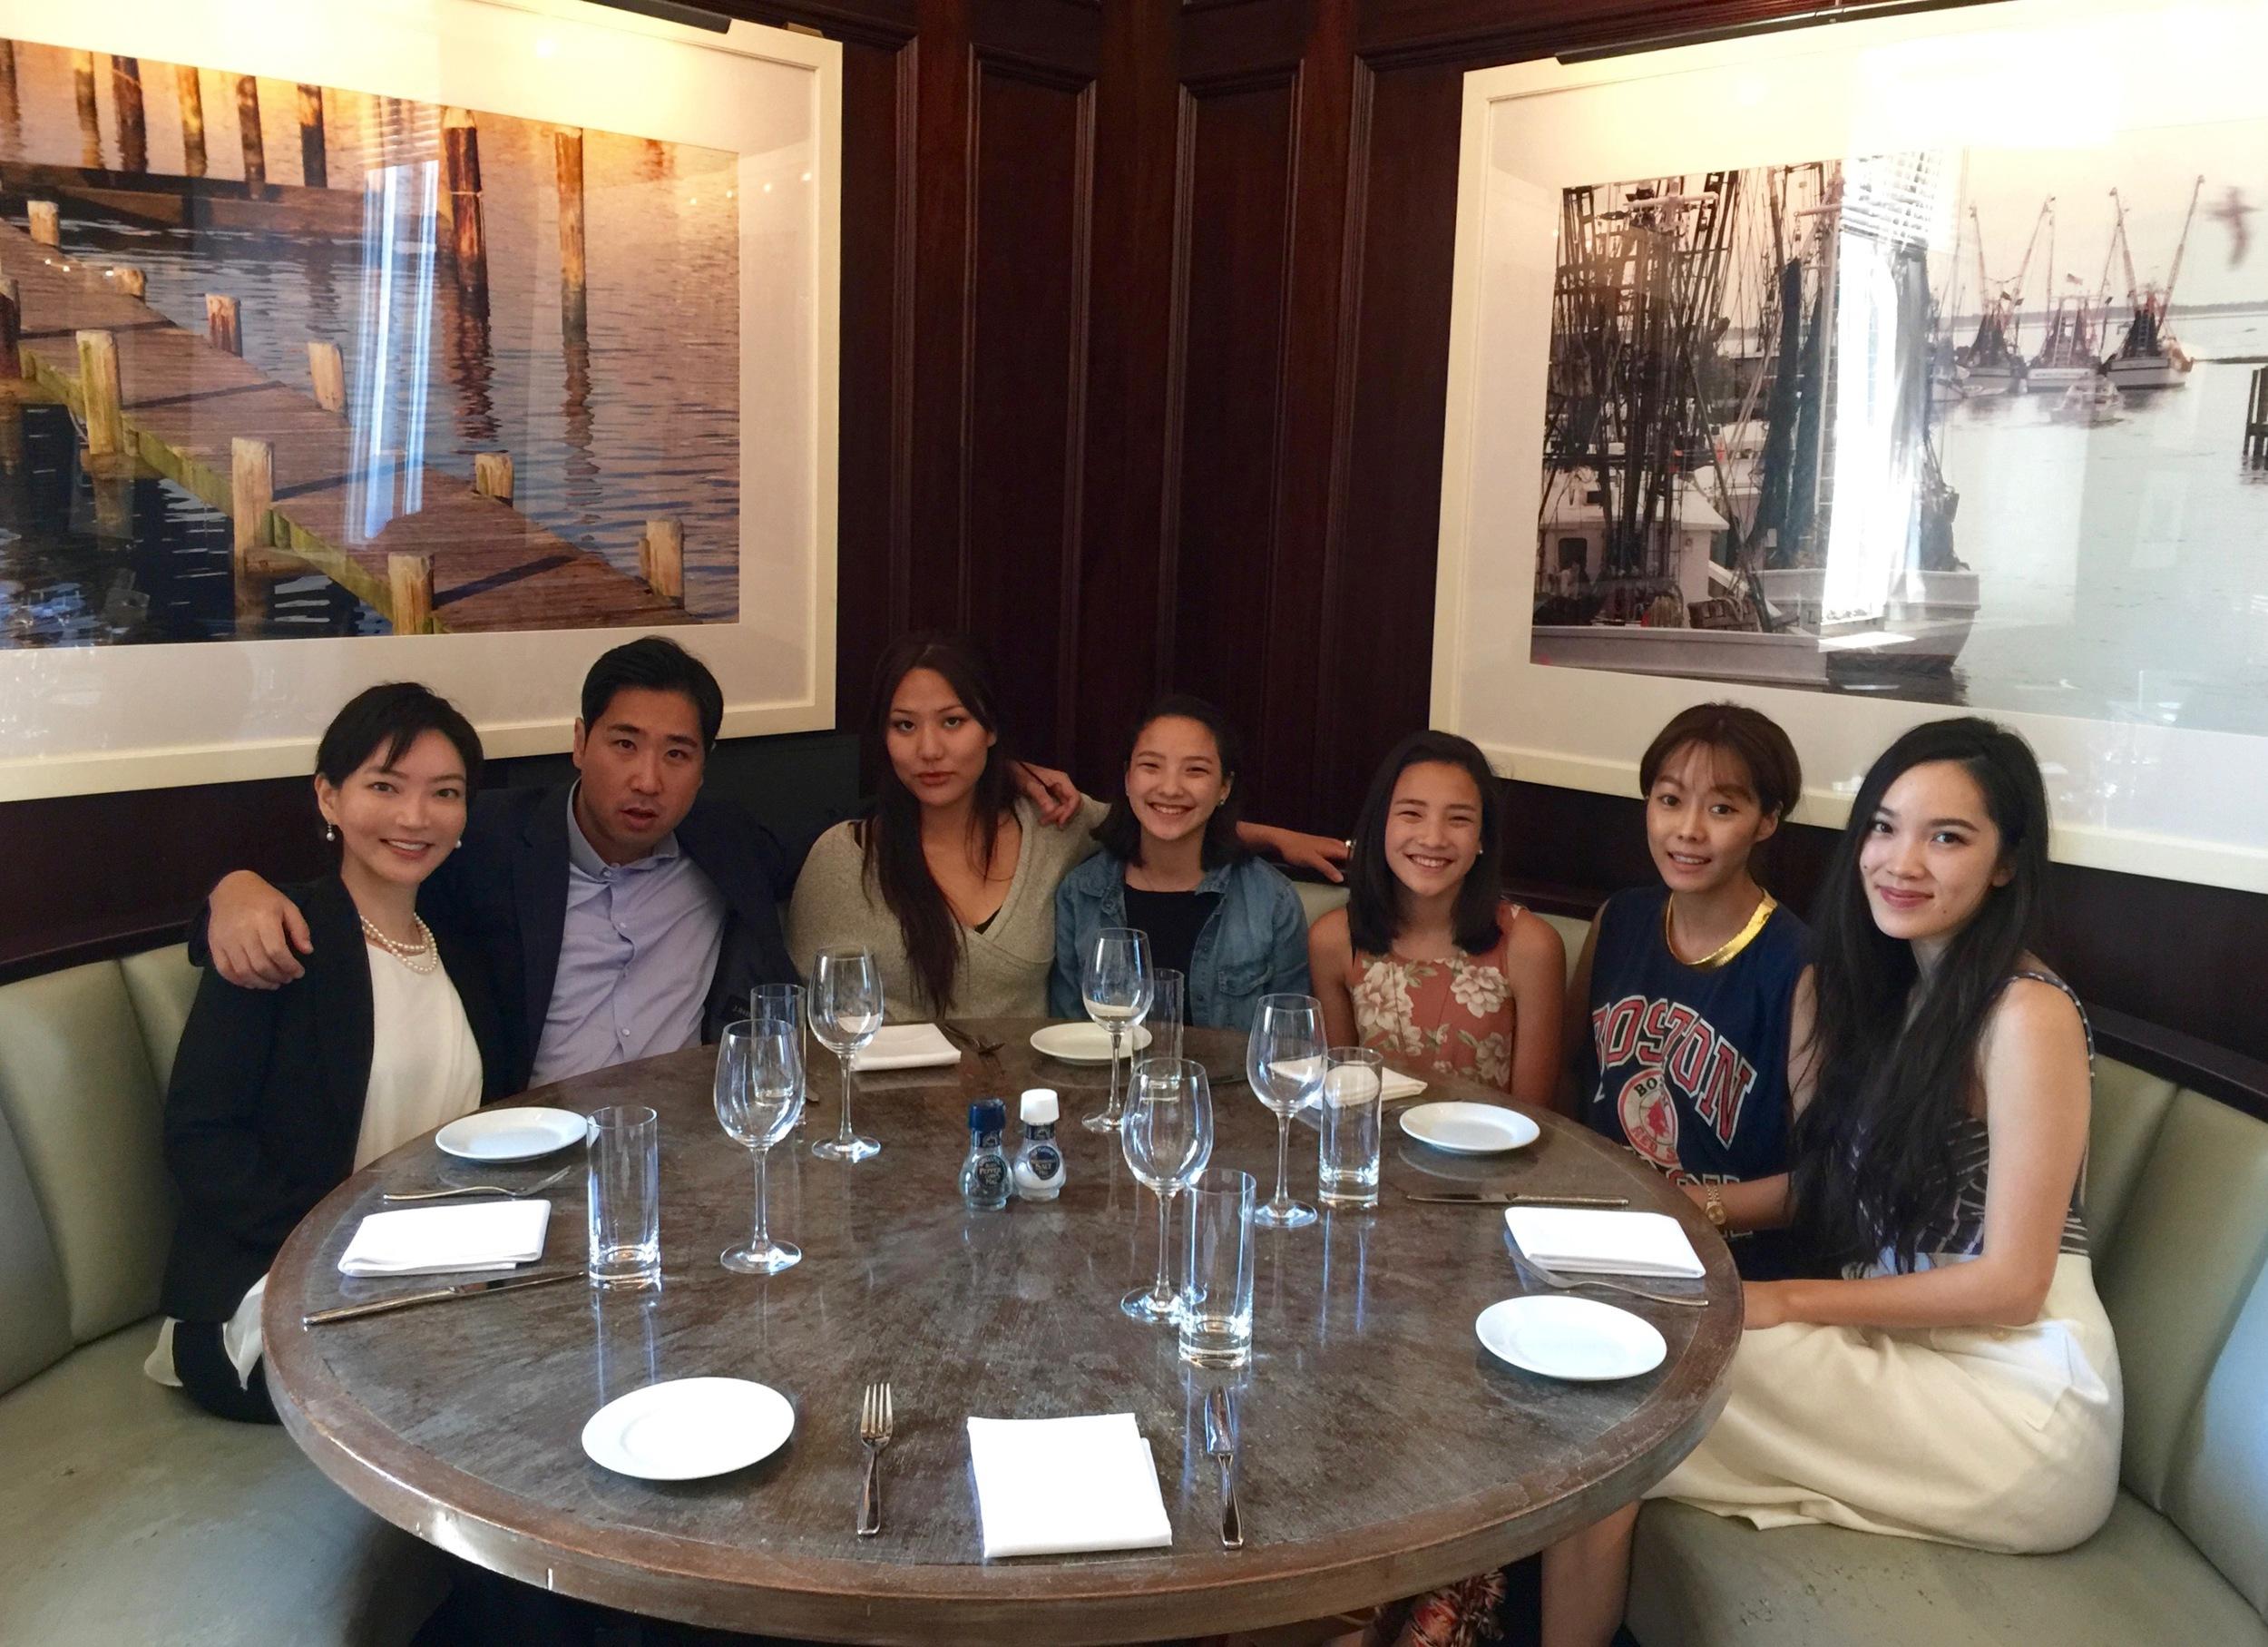 Dr. Chris Choi (left) with the cast Esteban Ahn, Rosalina Leigh, Nekhebet & Uatchet Juch, Sue Son, and Jessika Van